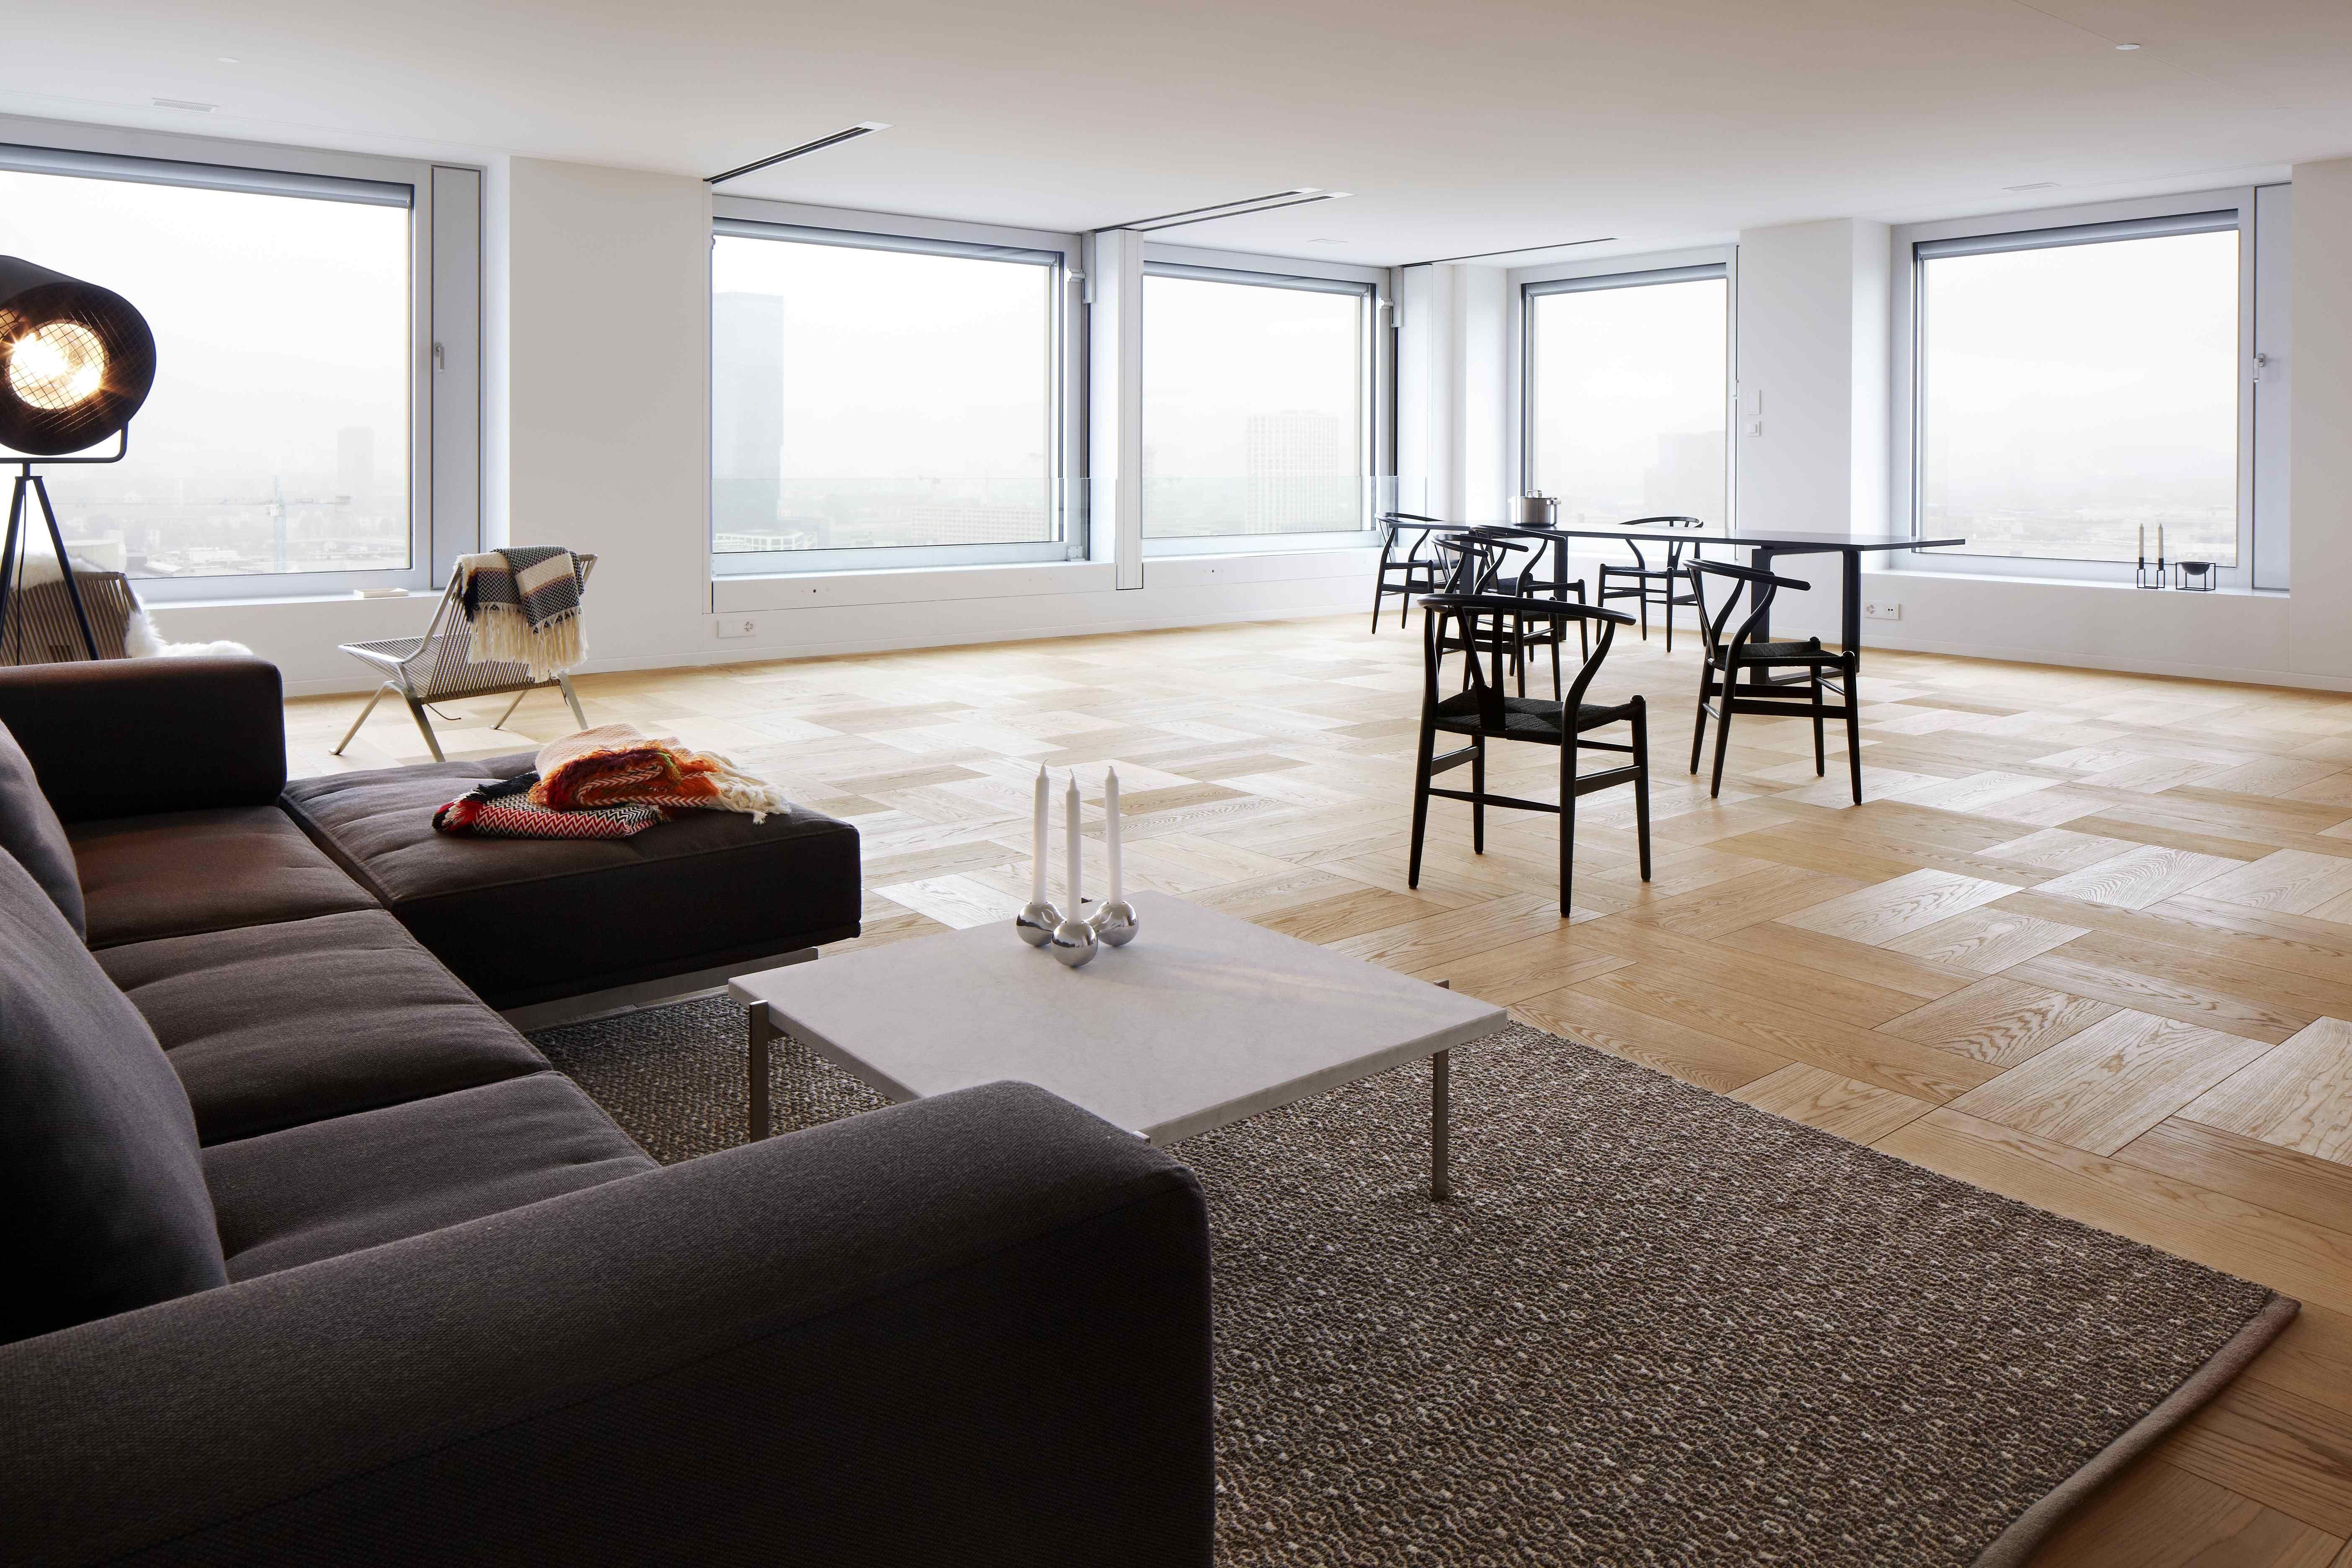 Delphi sofa by Hannes Wettstein from Erik Jørgensen, PK61 table by ...